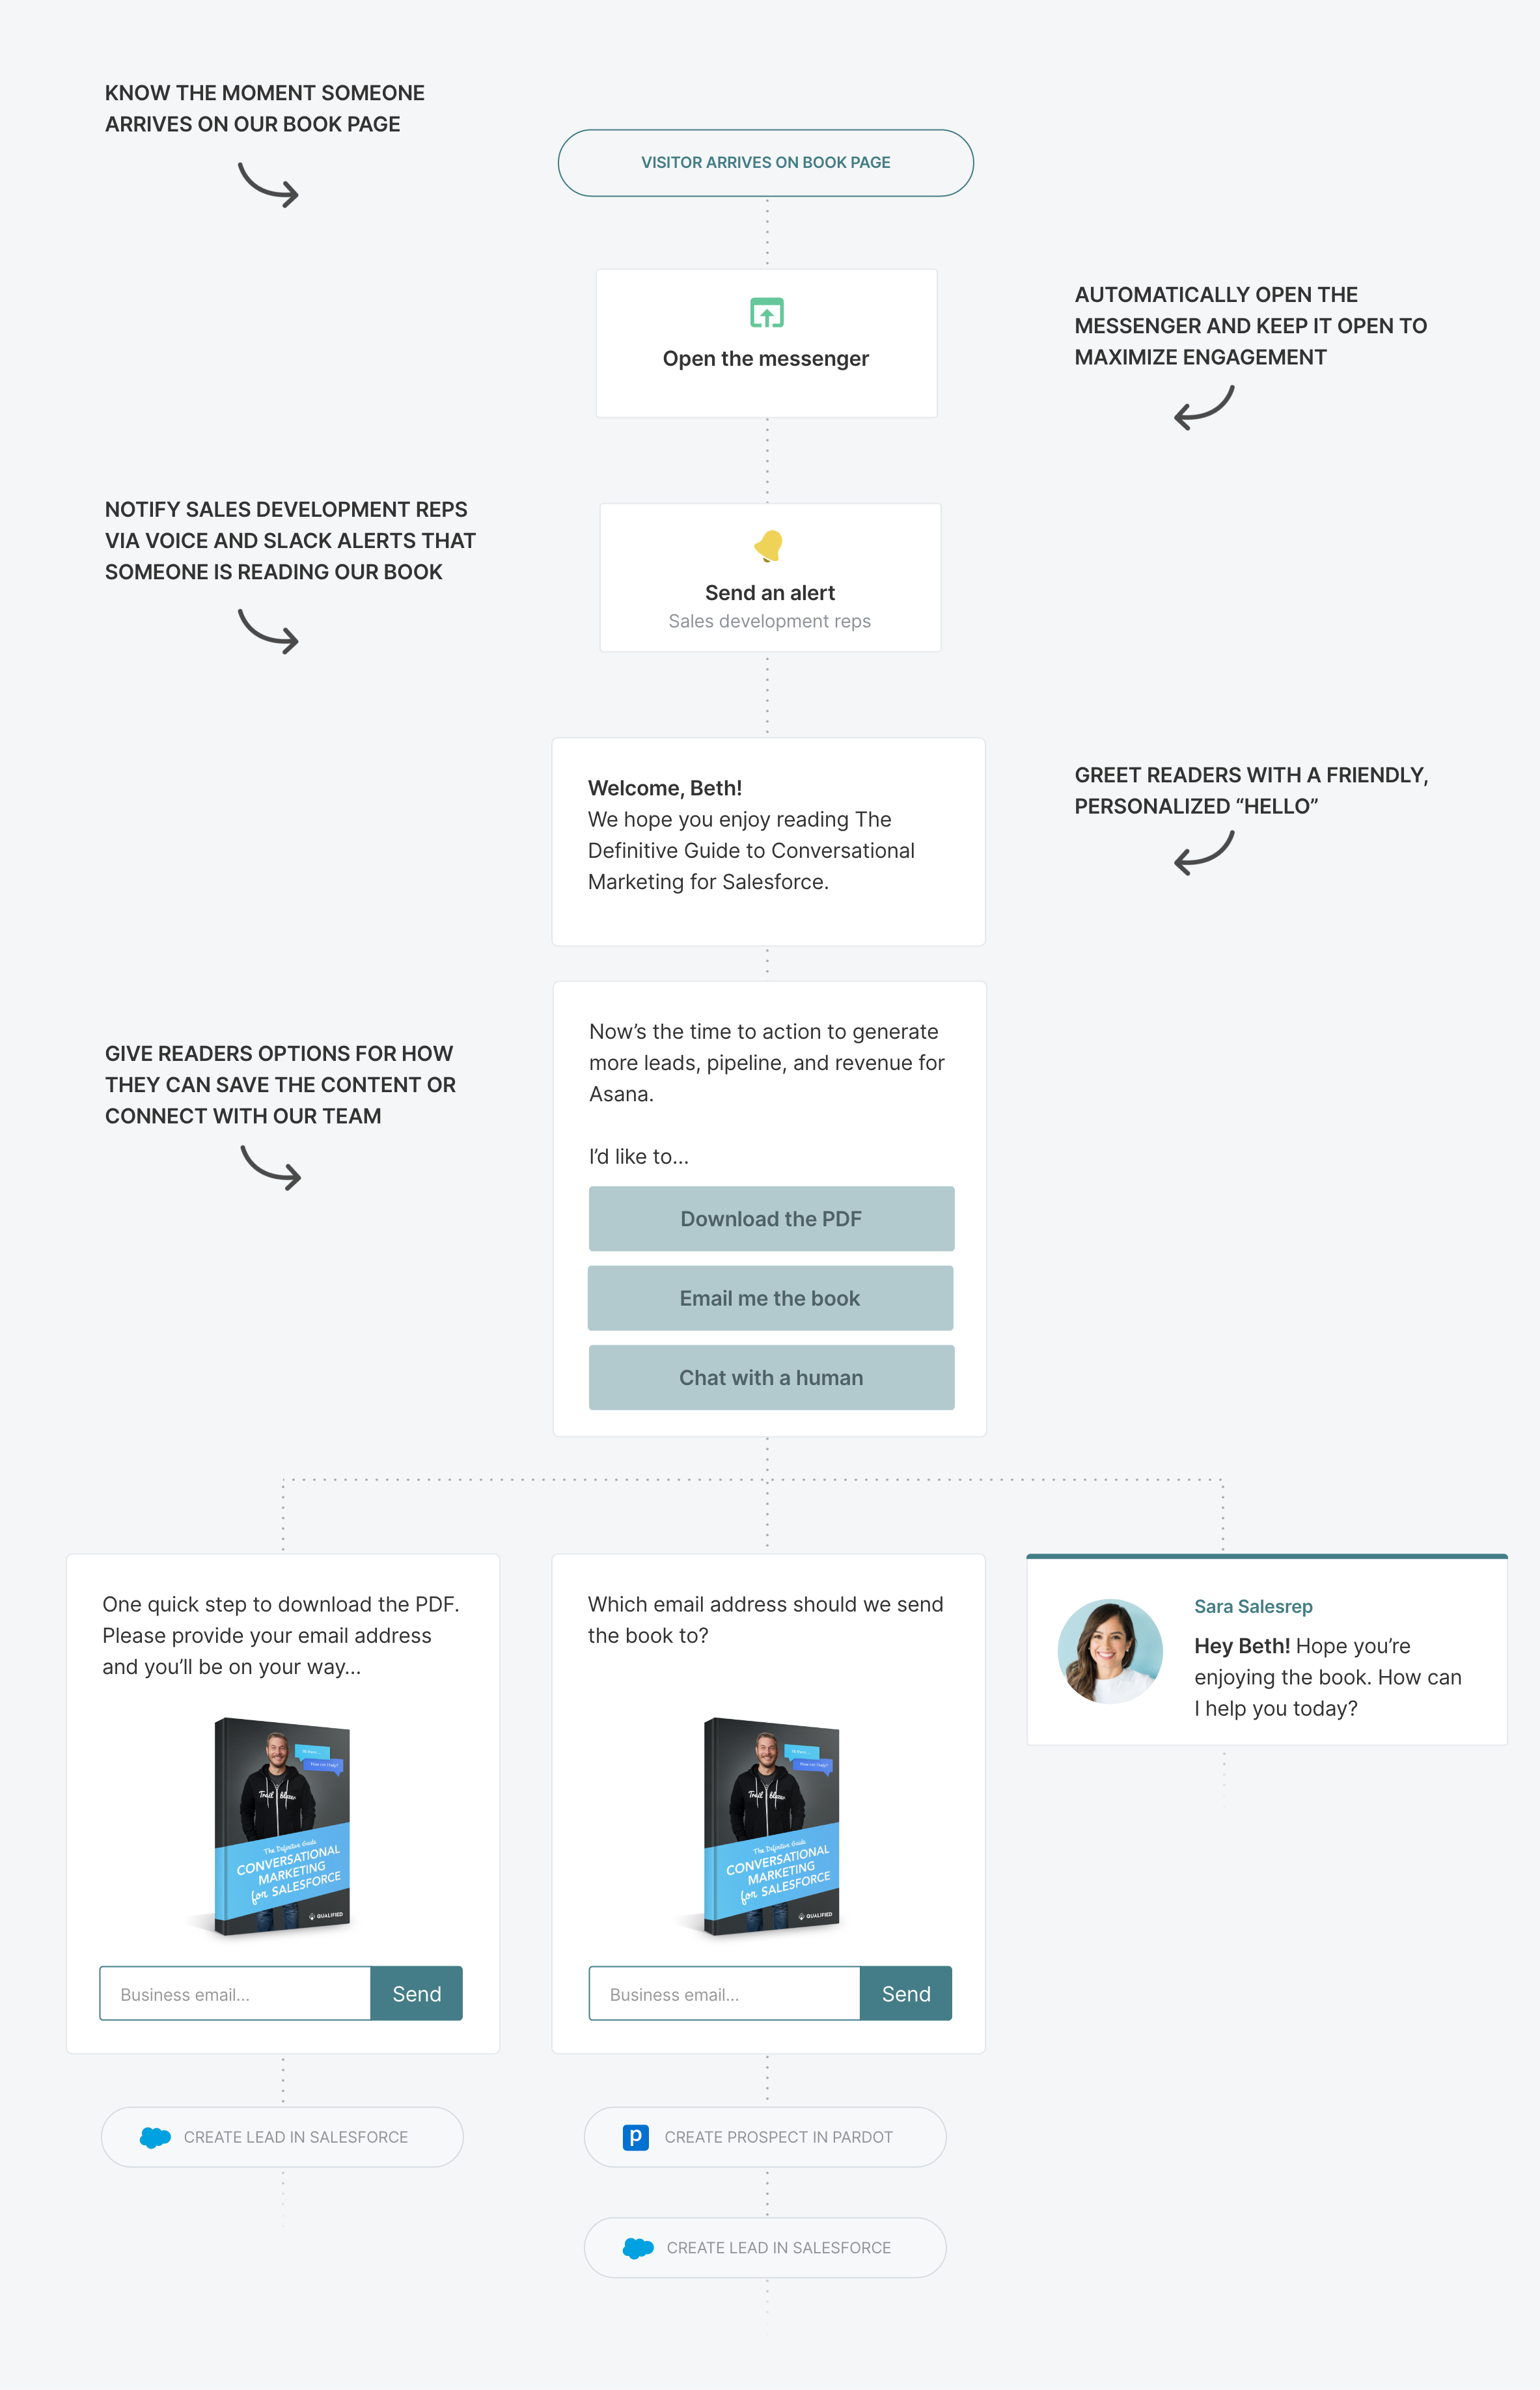 Conversational Content step 2: build the Conversational Marketing experience